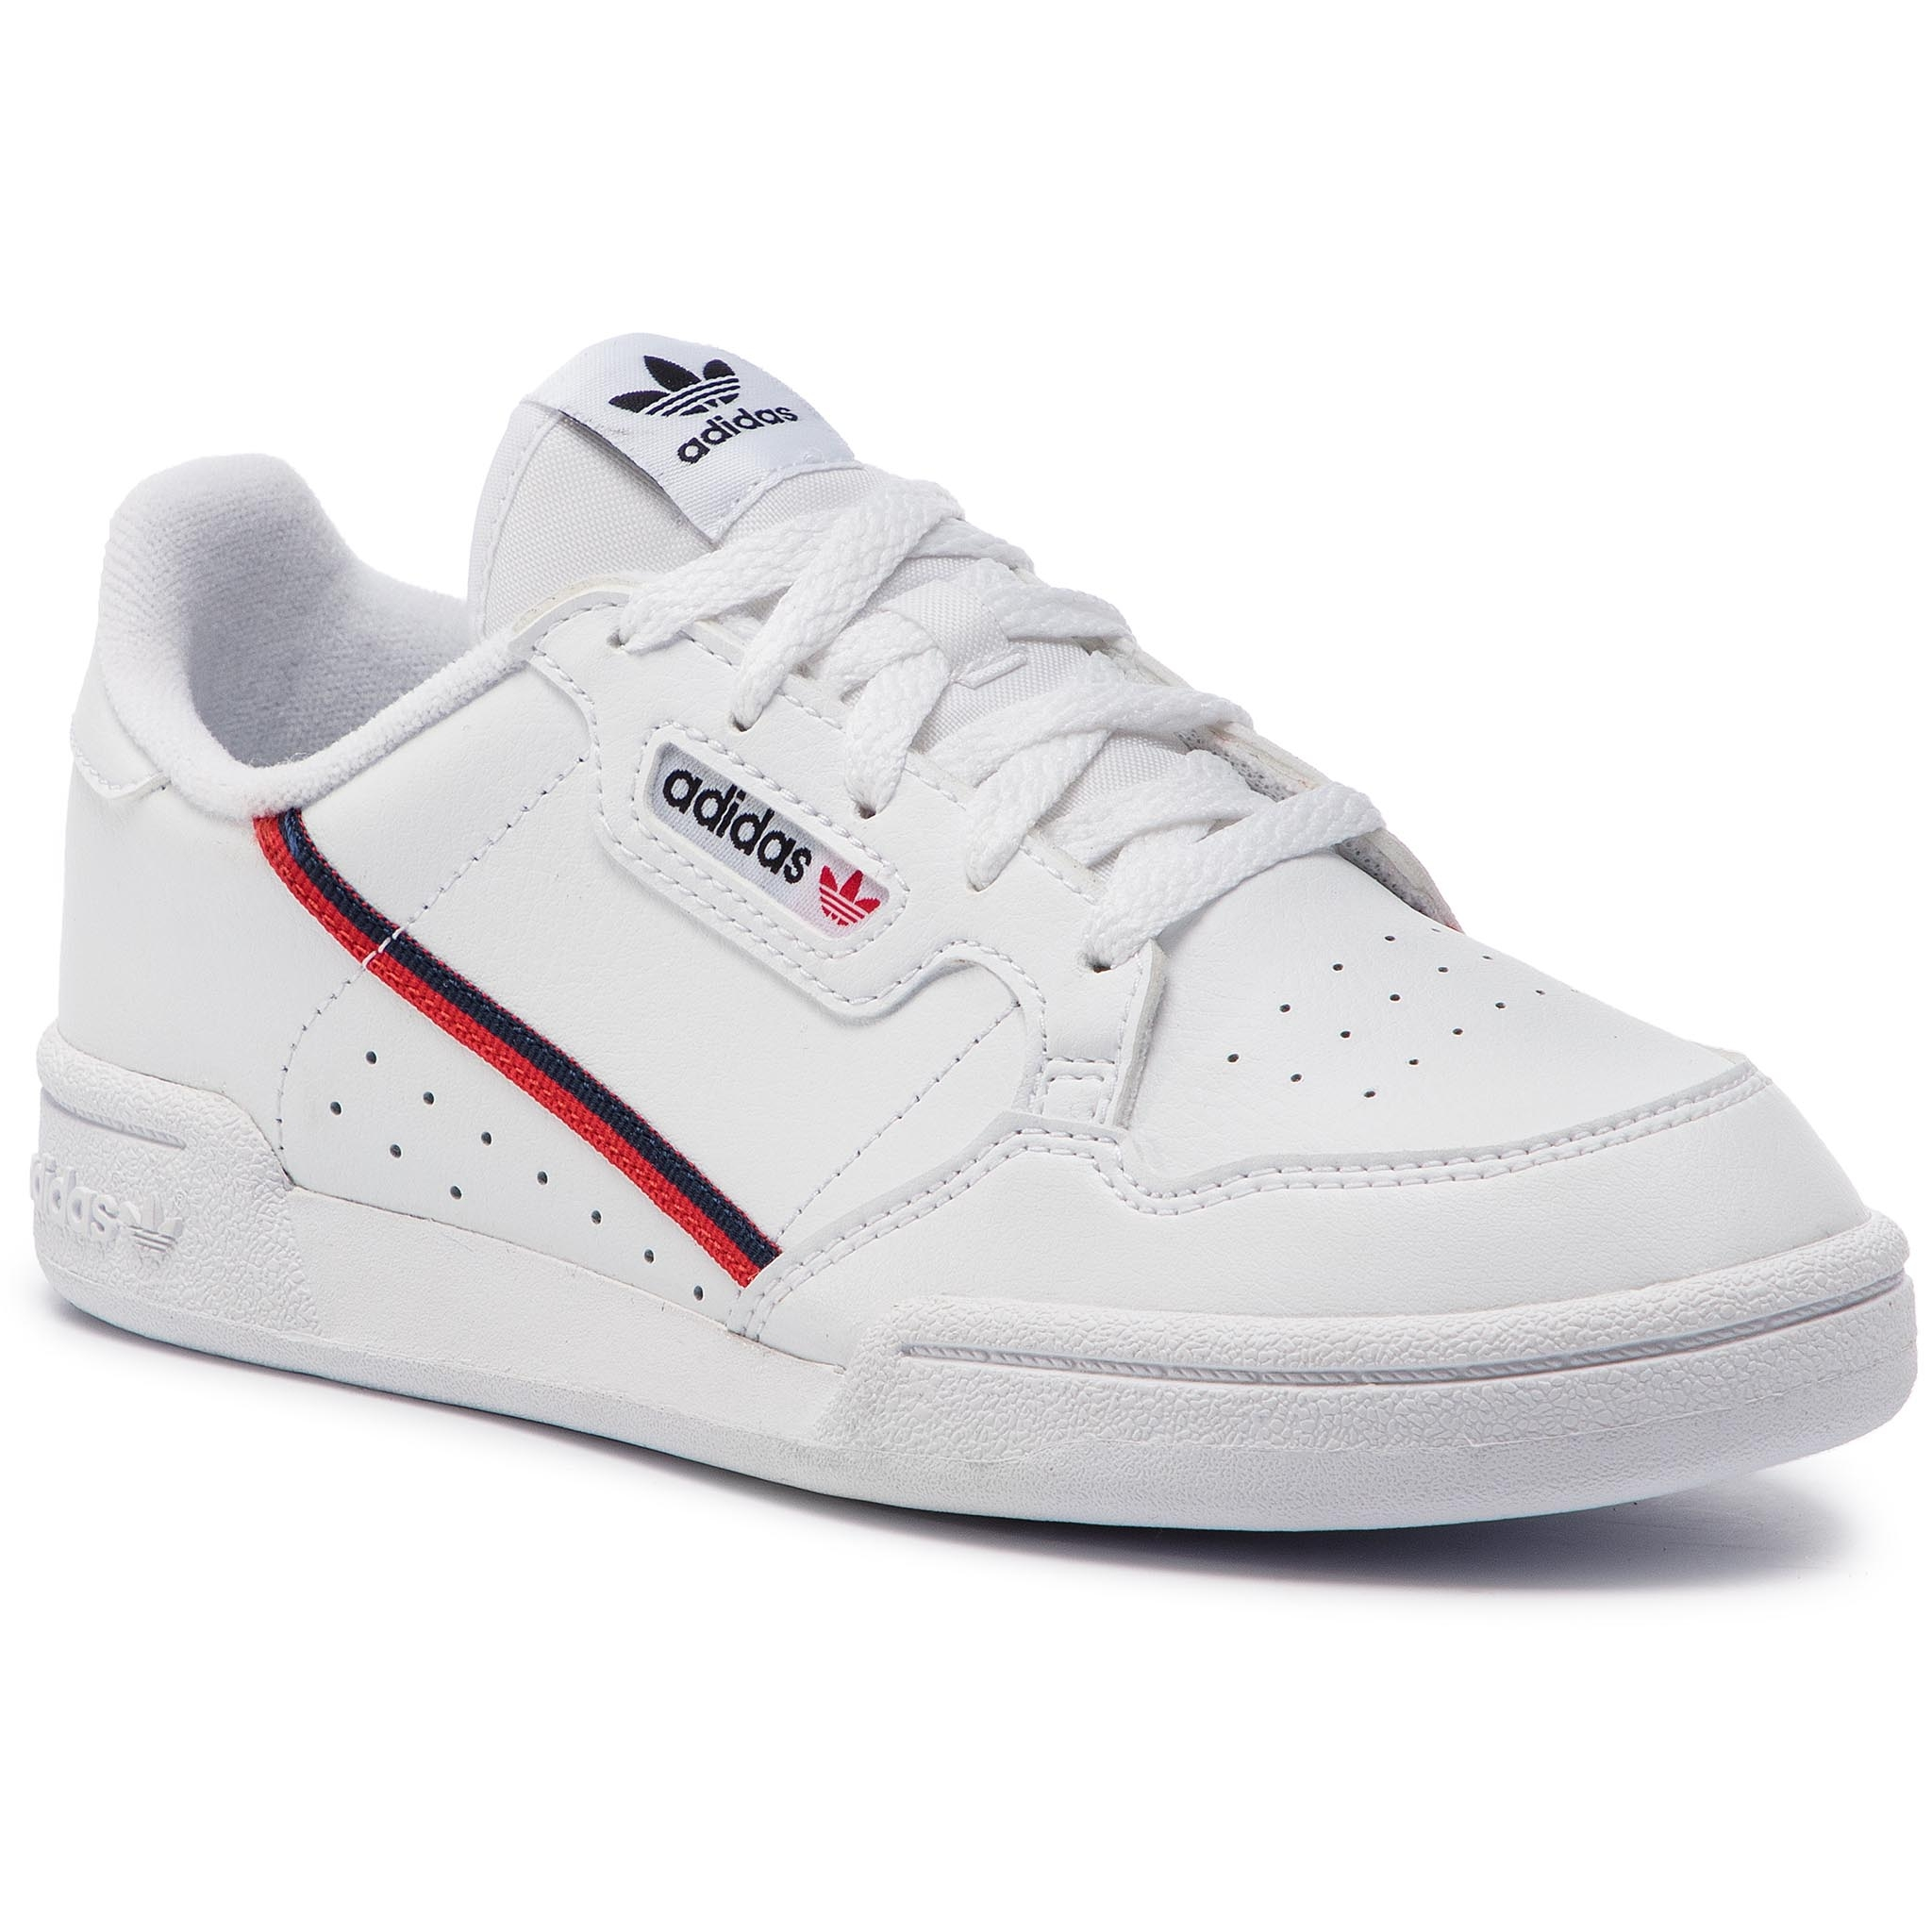 7e0da3690d Shoes adidas - Continental 80 J F99787 Ftwht/Scarle/Conavy ...